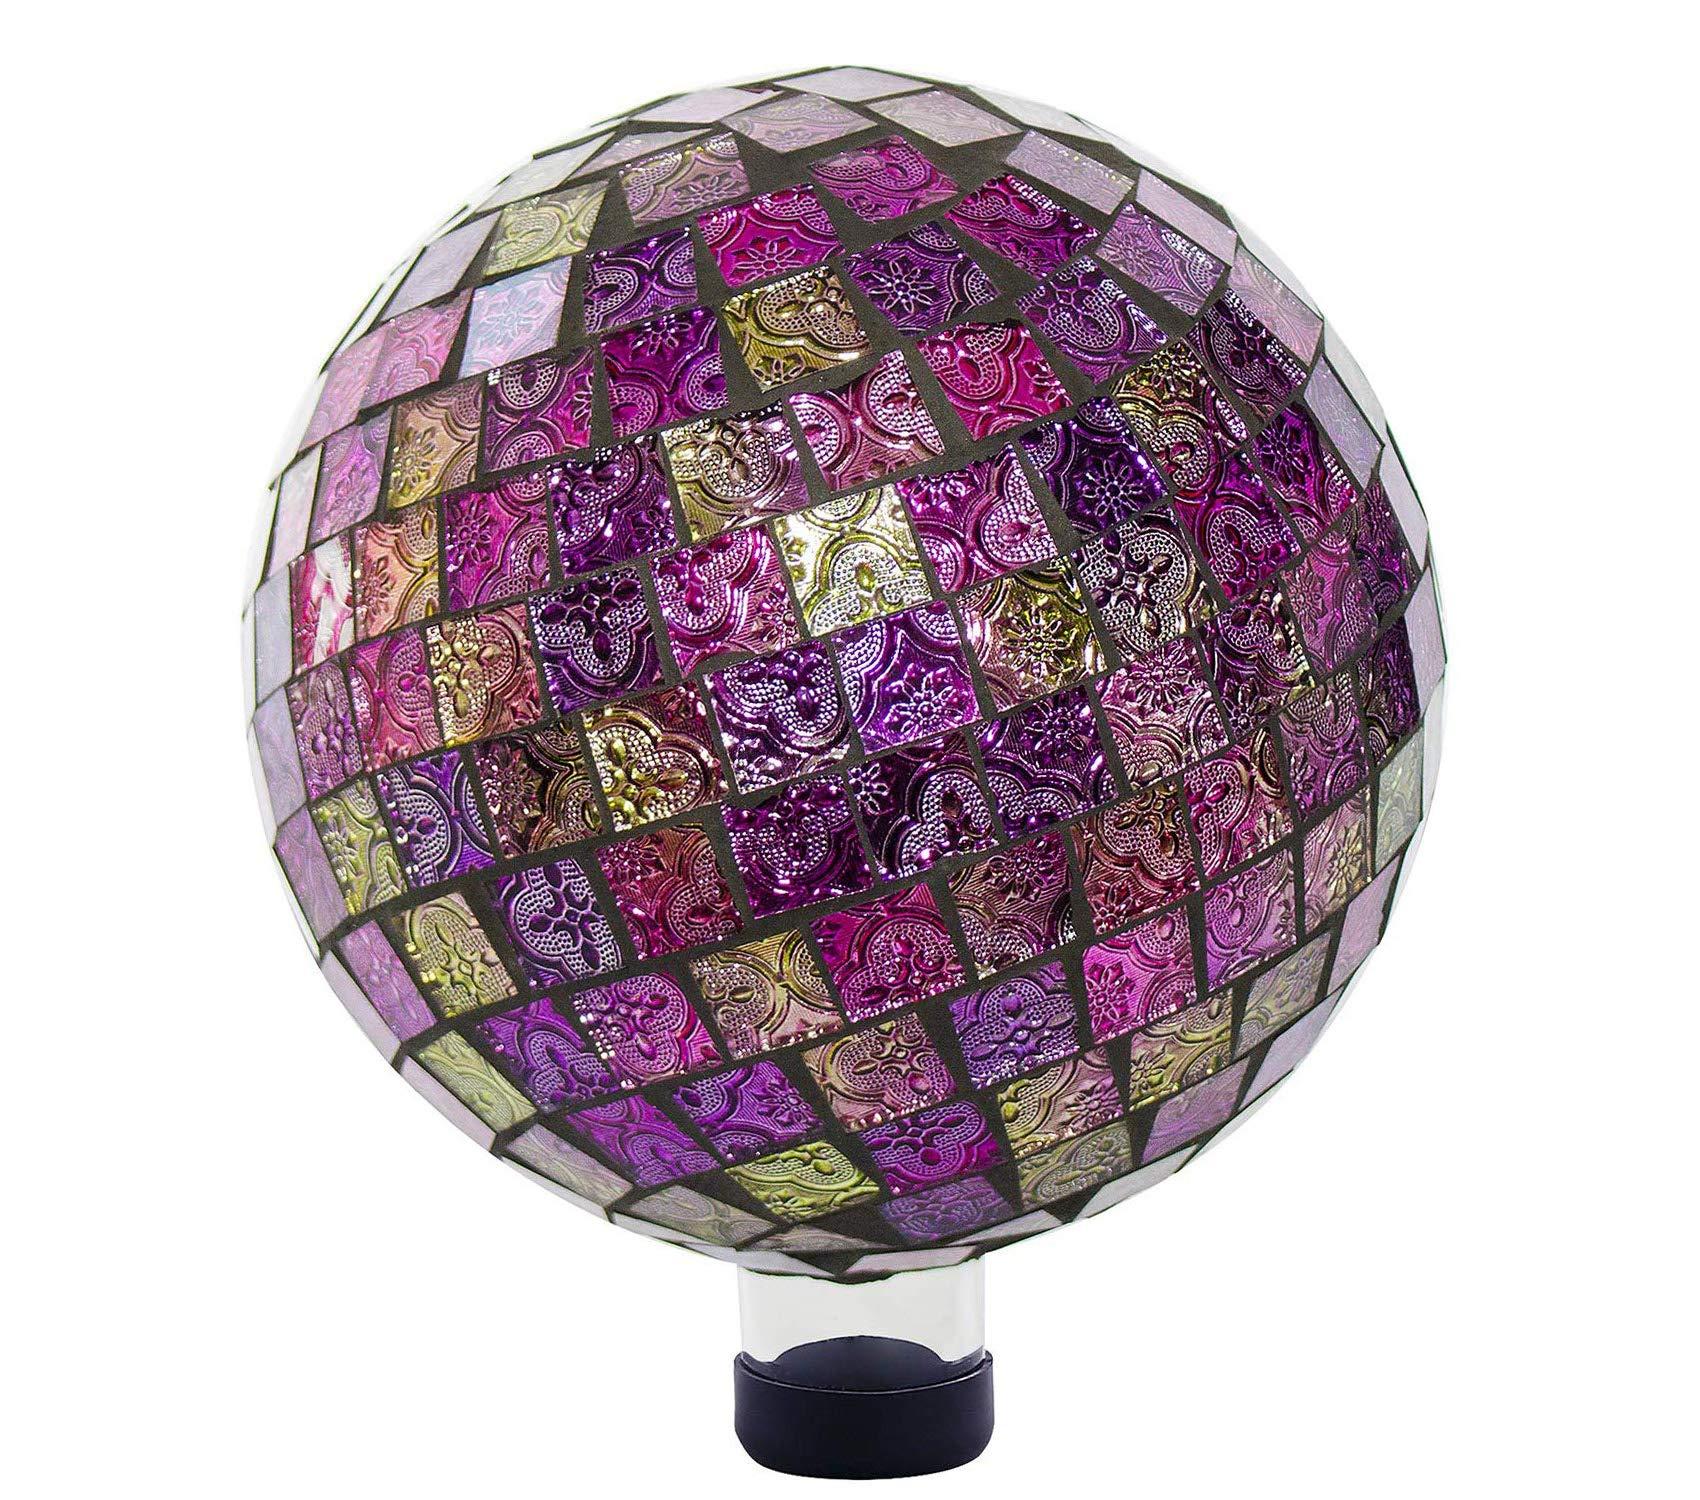 Outdoor Garden Backyard Décor Mosaic Gazing Globe, 11 Inch Tall, Violet